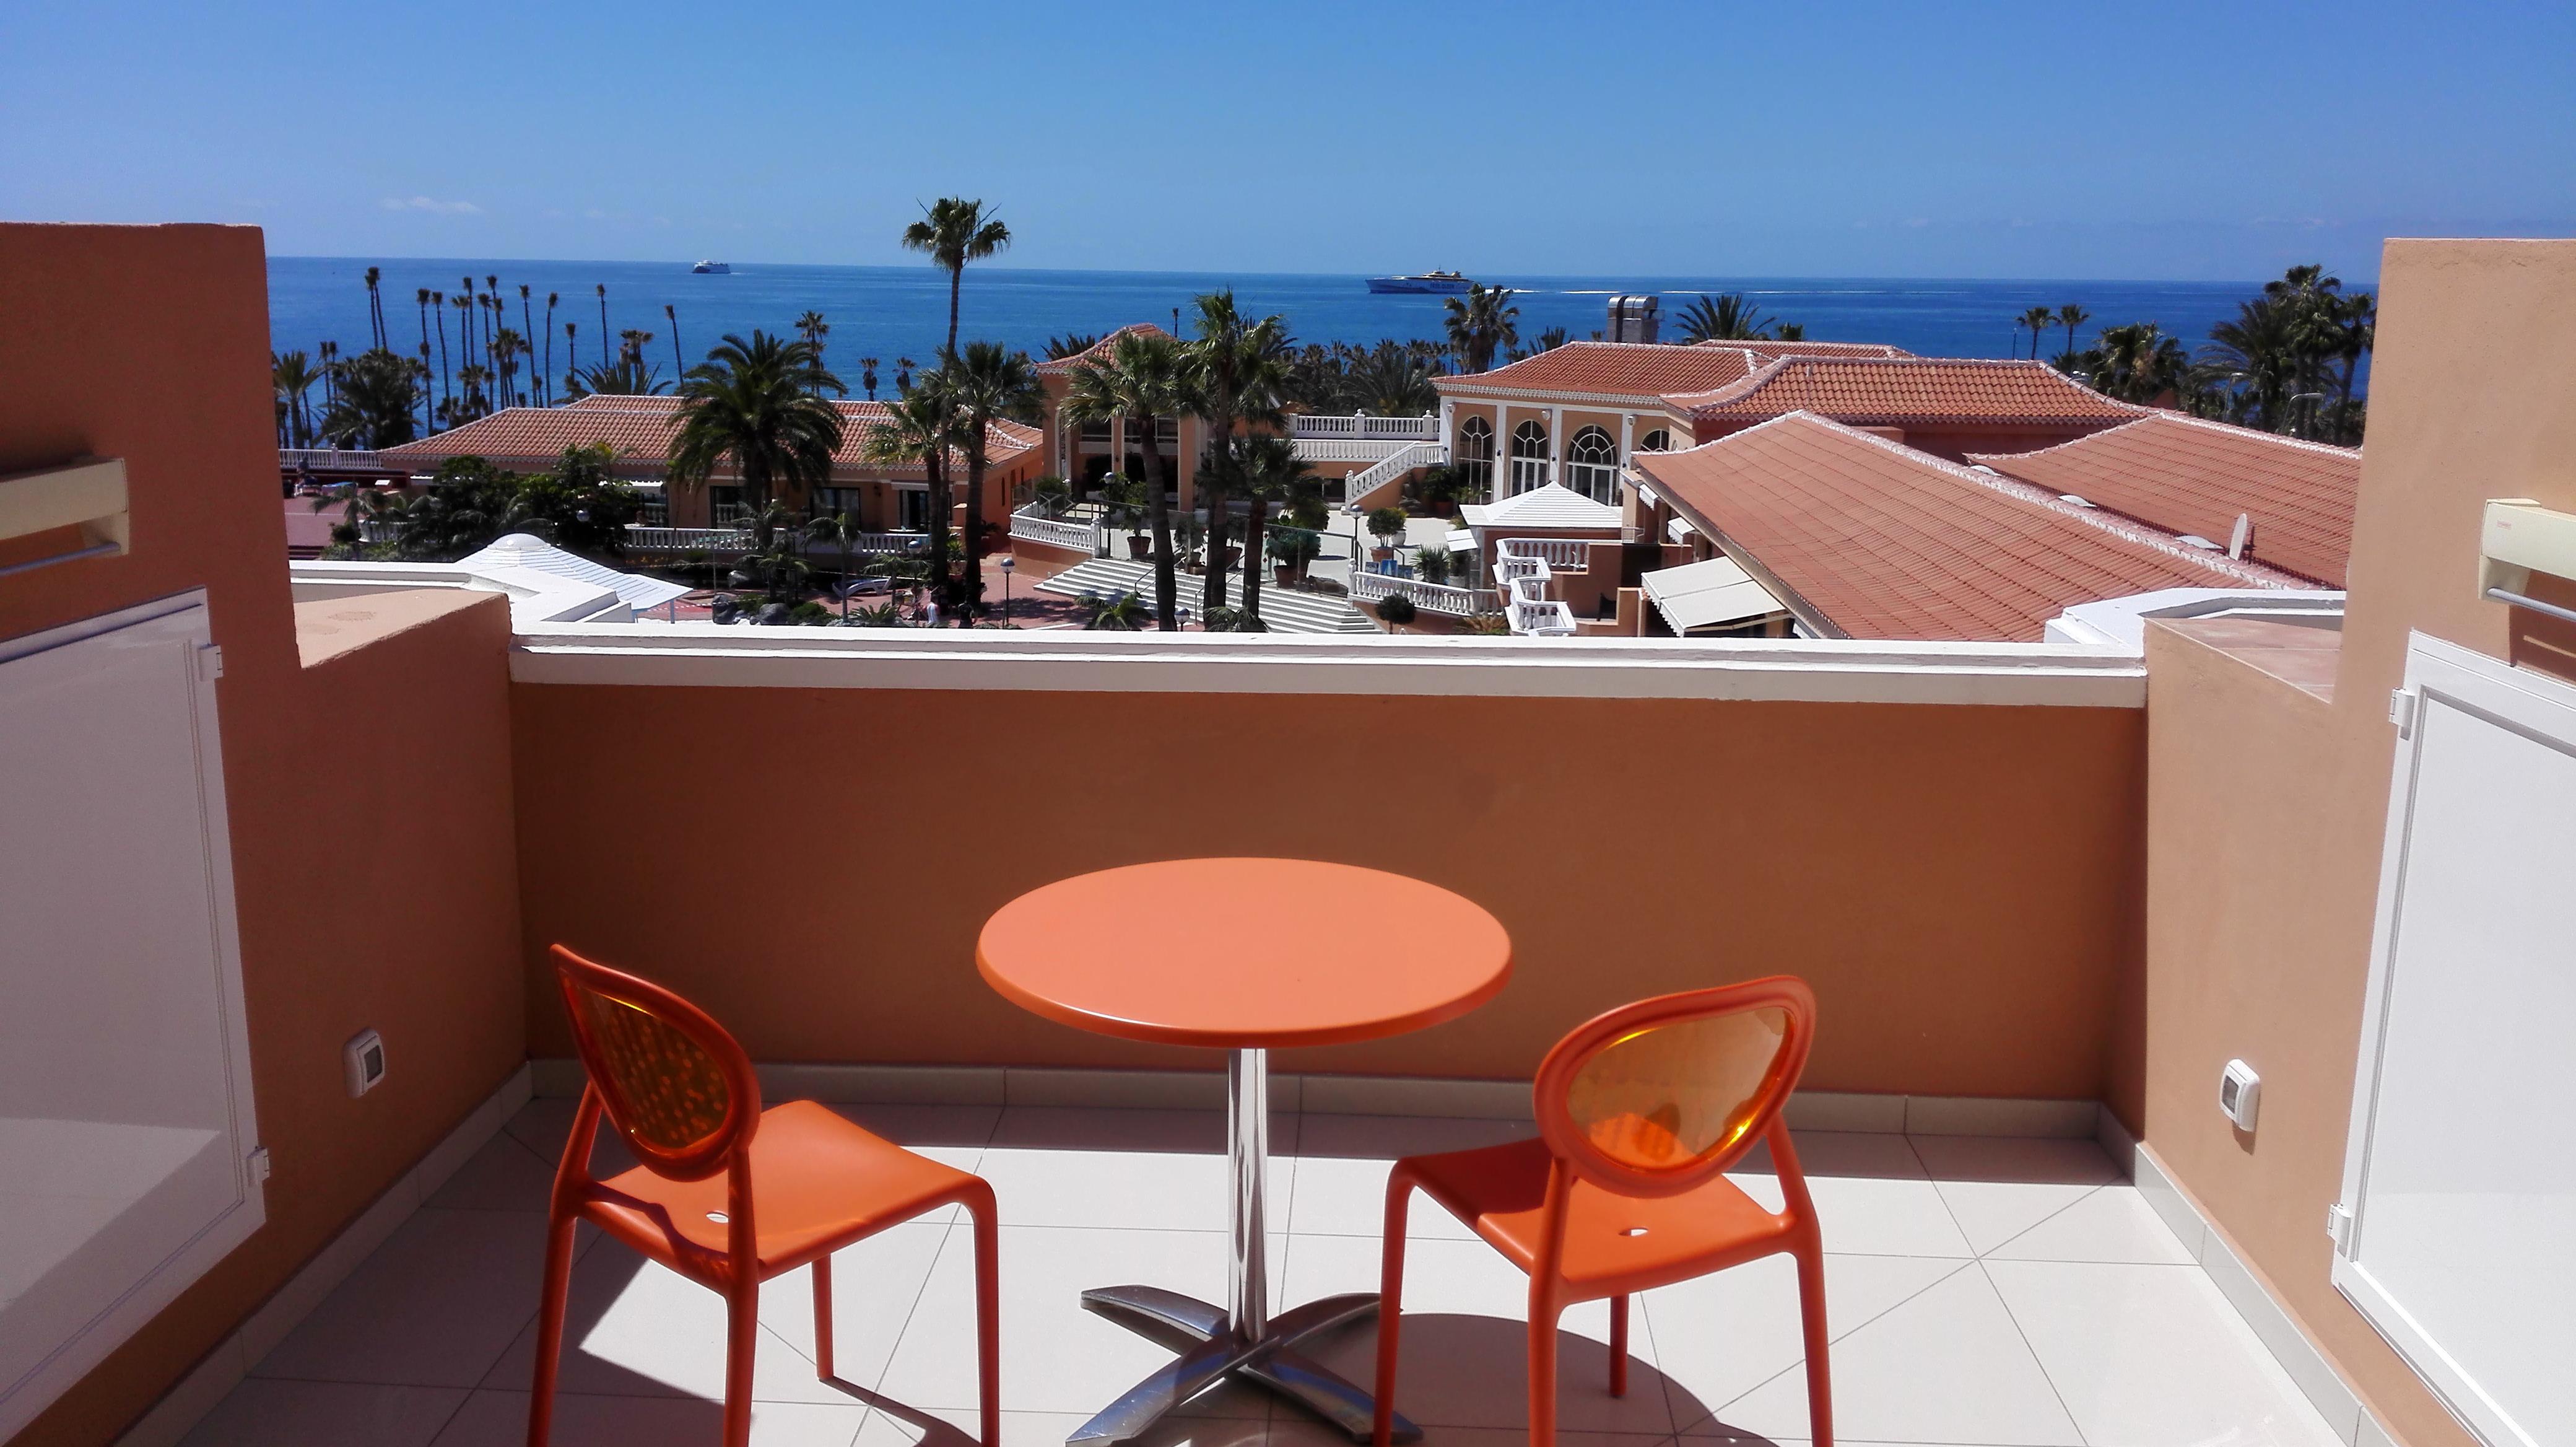 Apartment for Sale at Tenerife Royal Garden Avenida Luis Diaz de Losada Other Tenerife Canary Islands, Tenerife Canary Islands, 38660 Spain